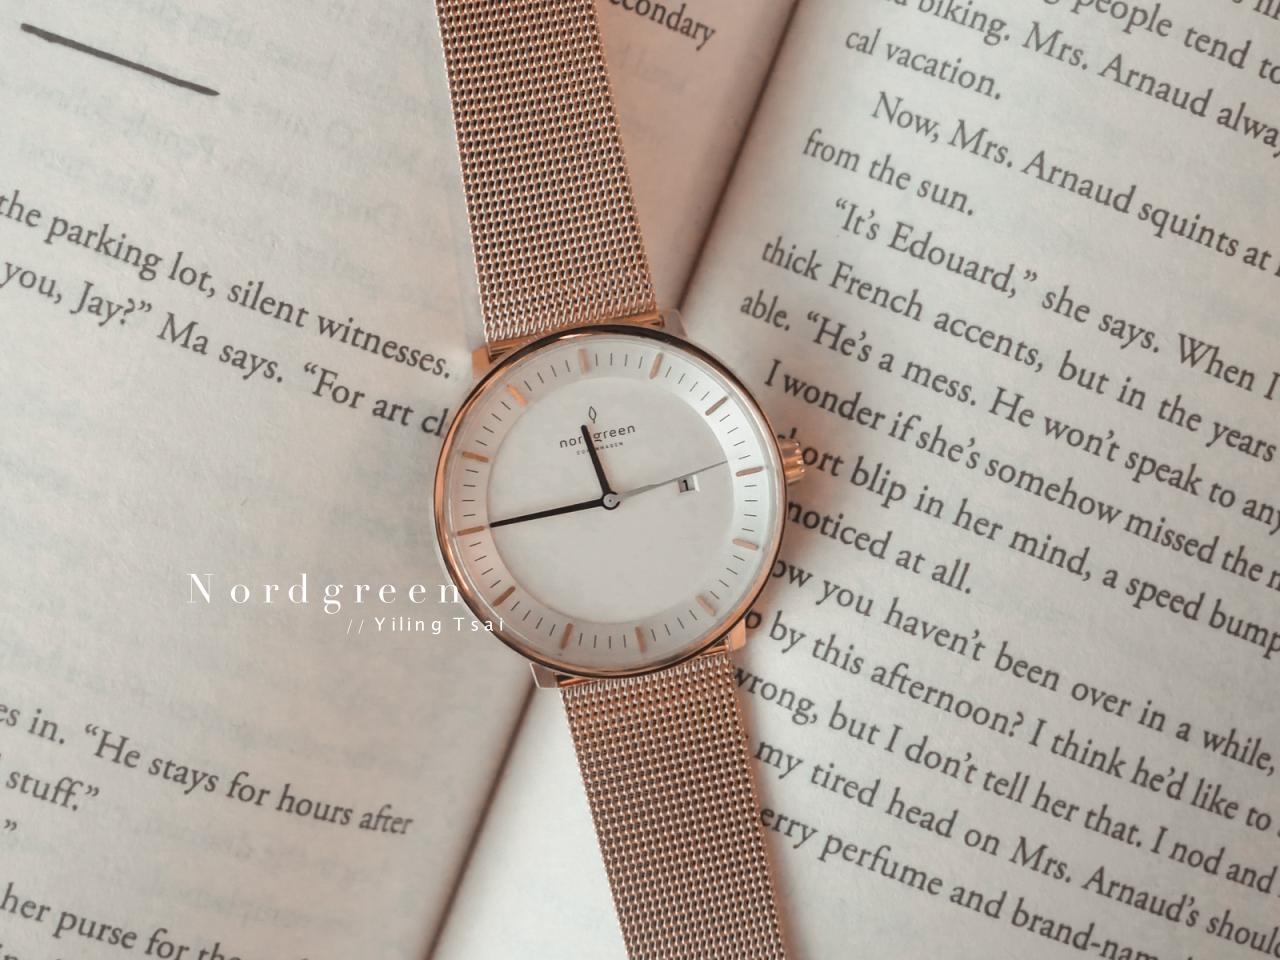 Nordgreen 北歐丹麥設計手錶品牌 蔡小妞讀者專屬官網折扣碼